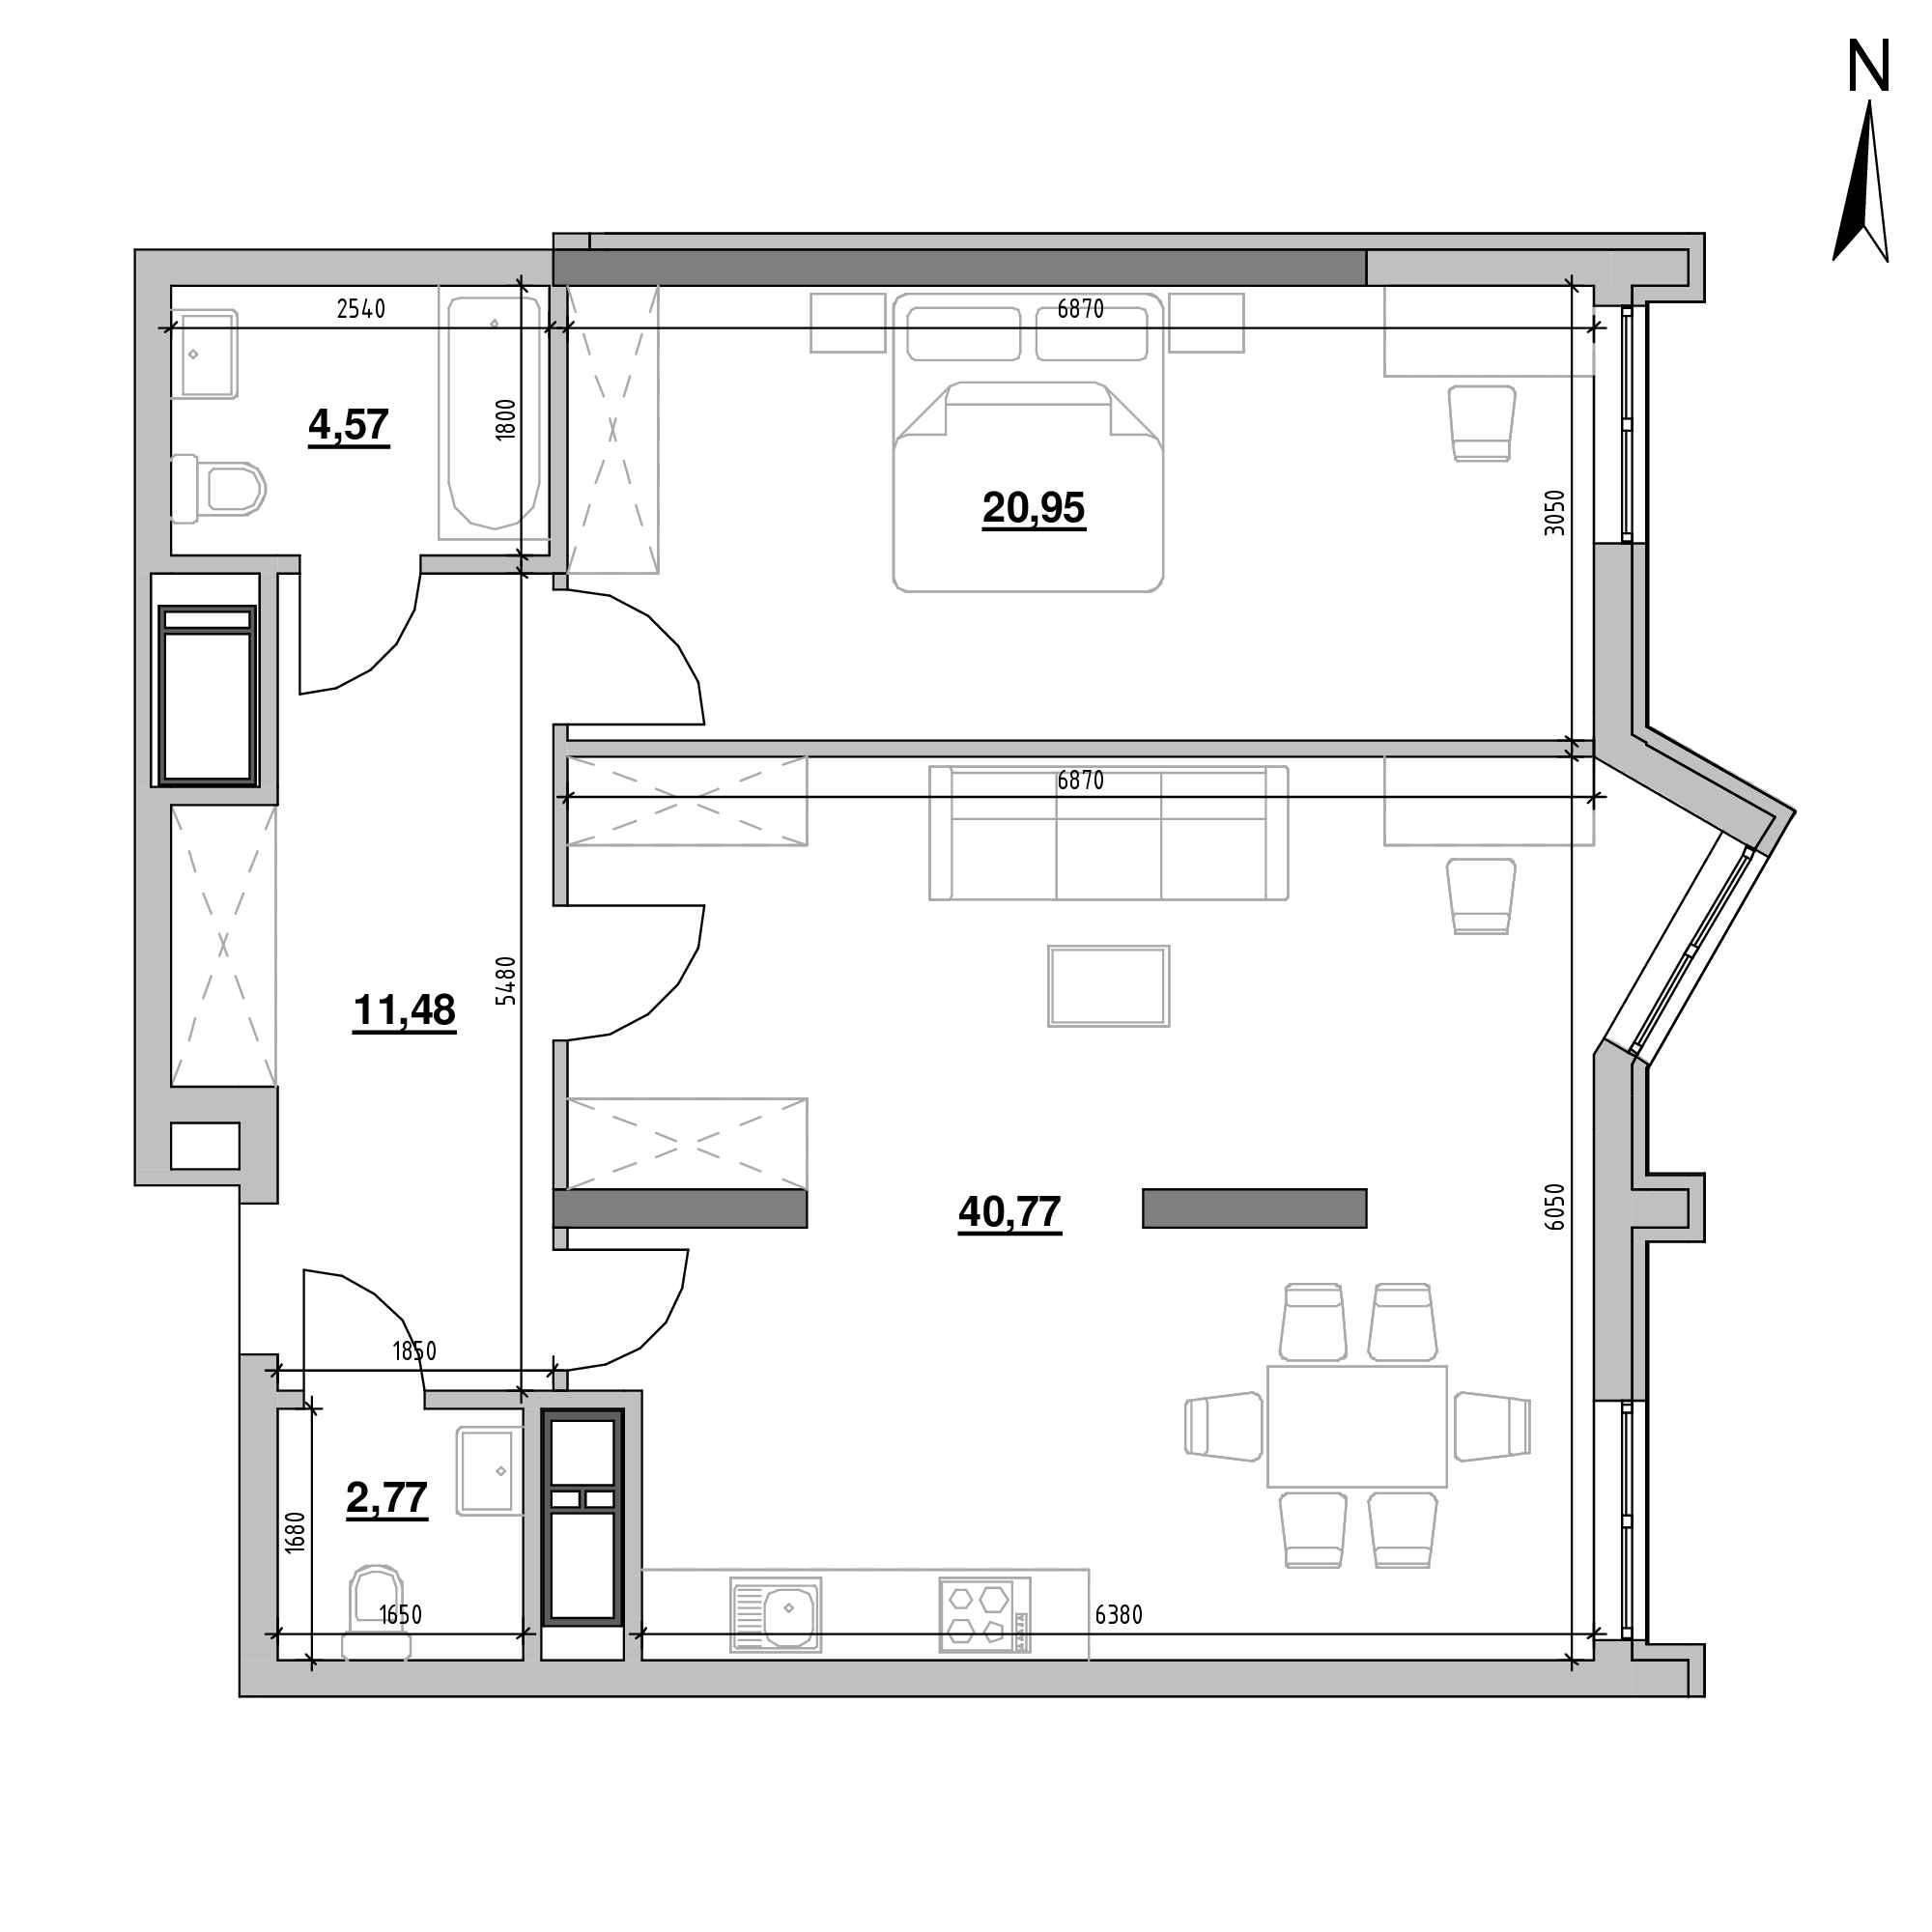 ЖК Nordica Residence: планування 1-кімнатної квартири, №26, 80.54 м<sup>2</sup>